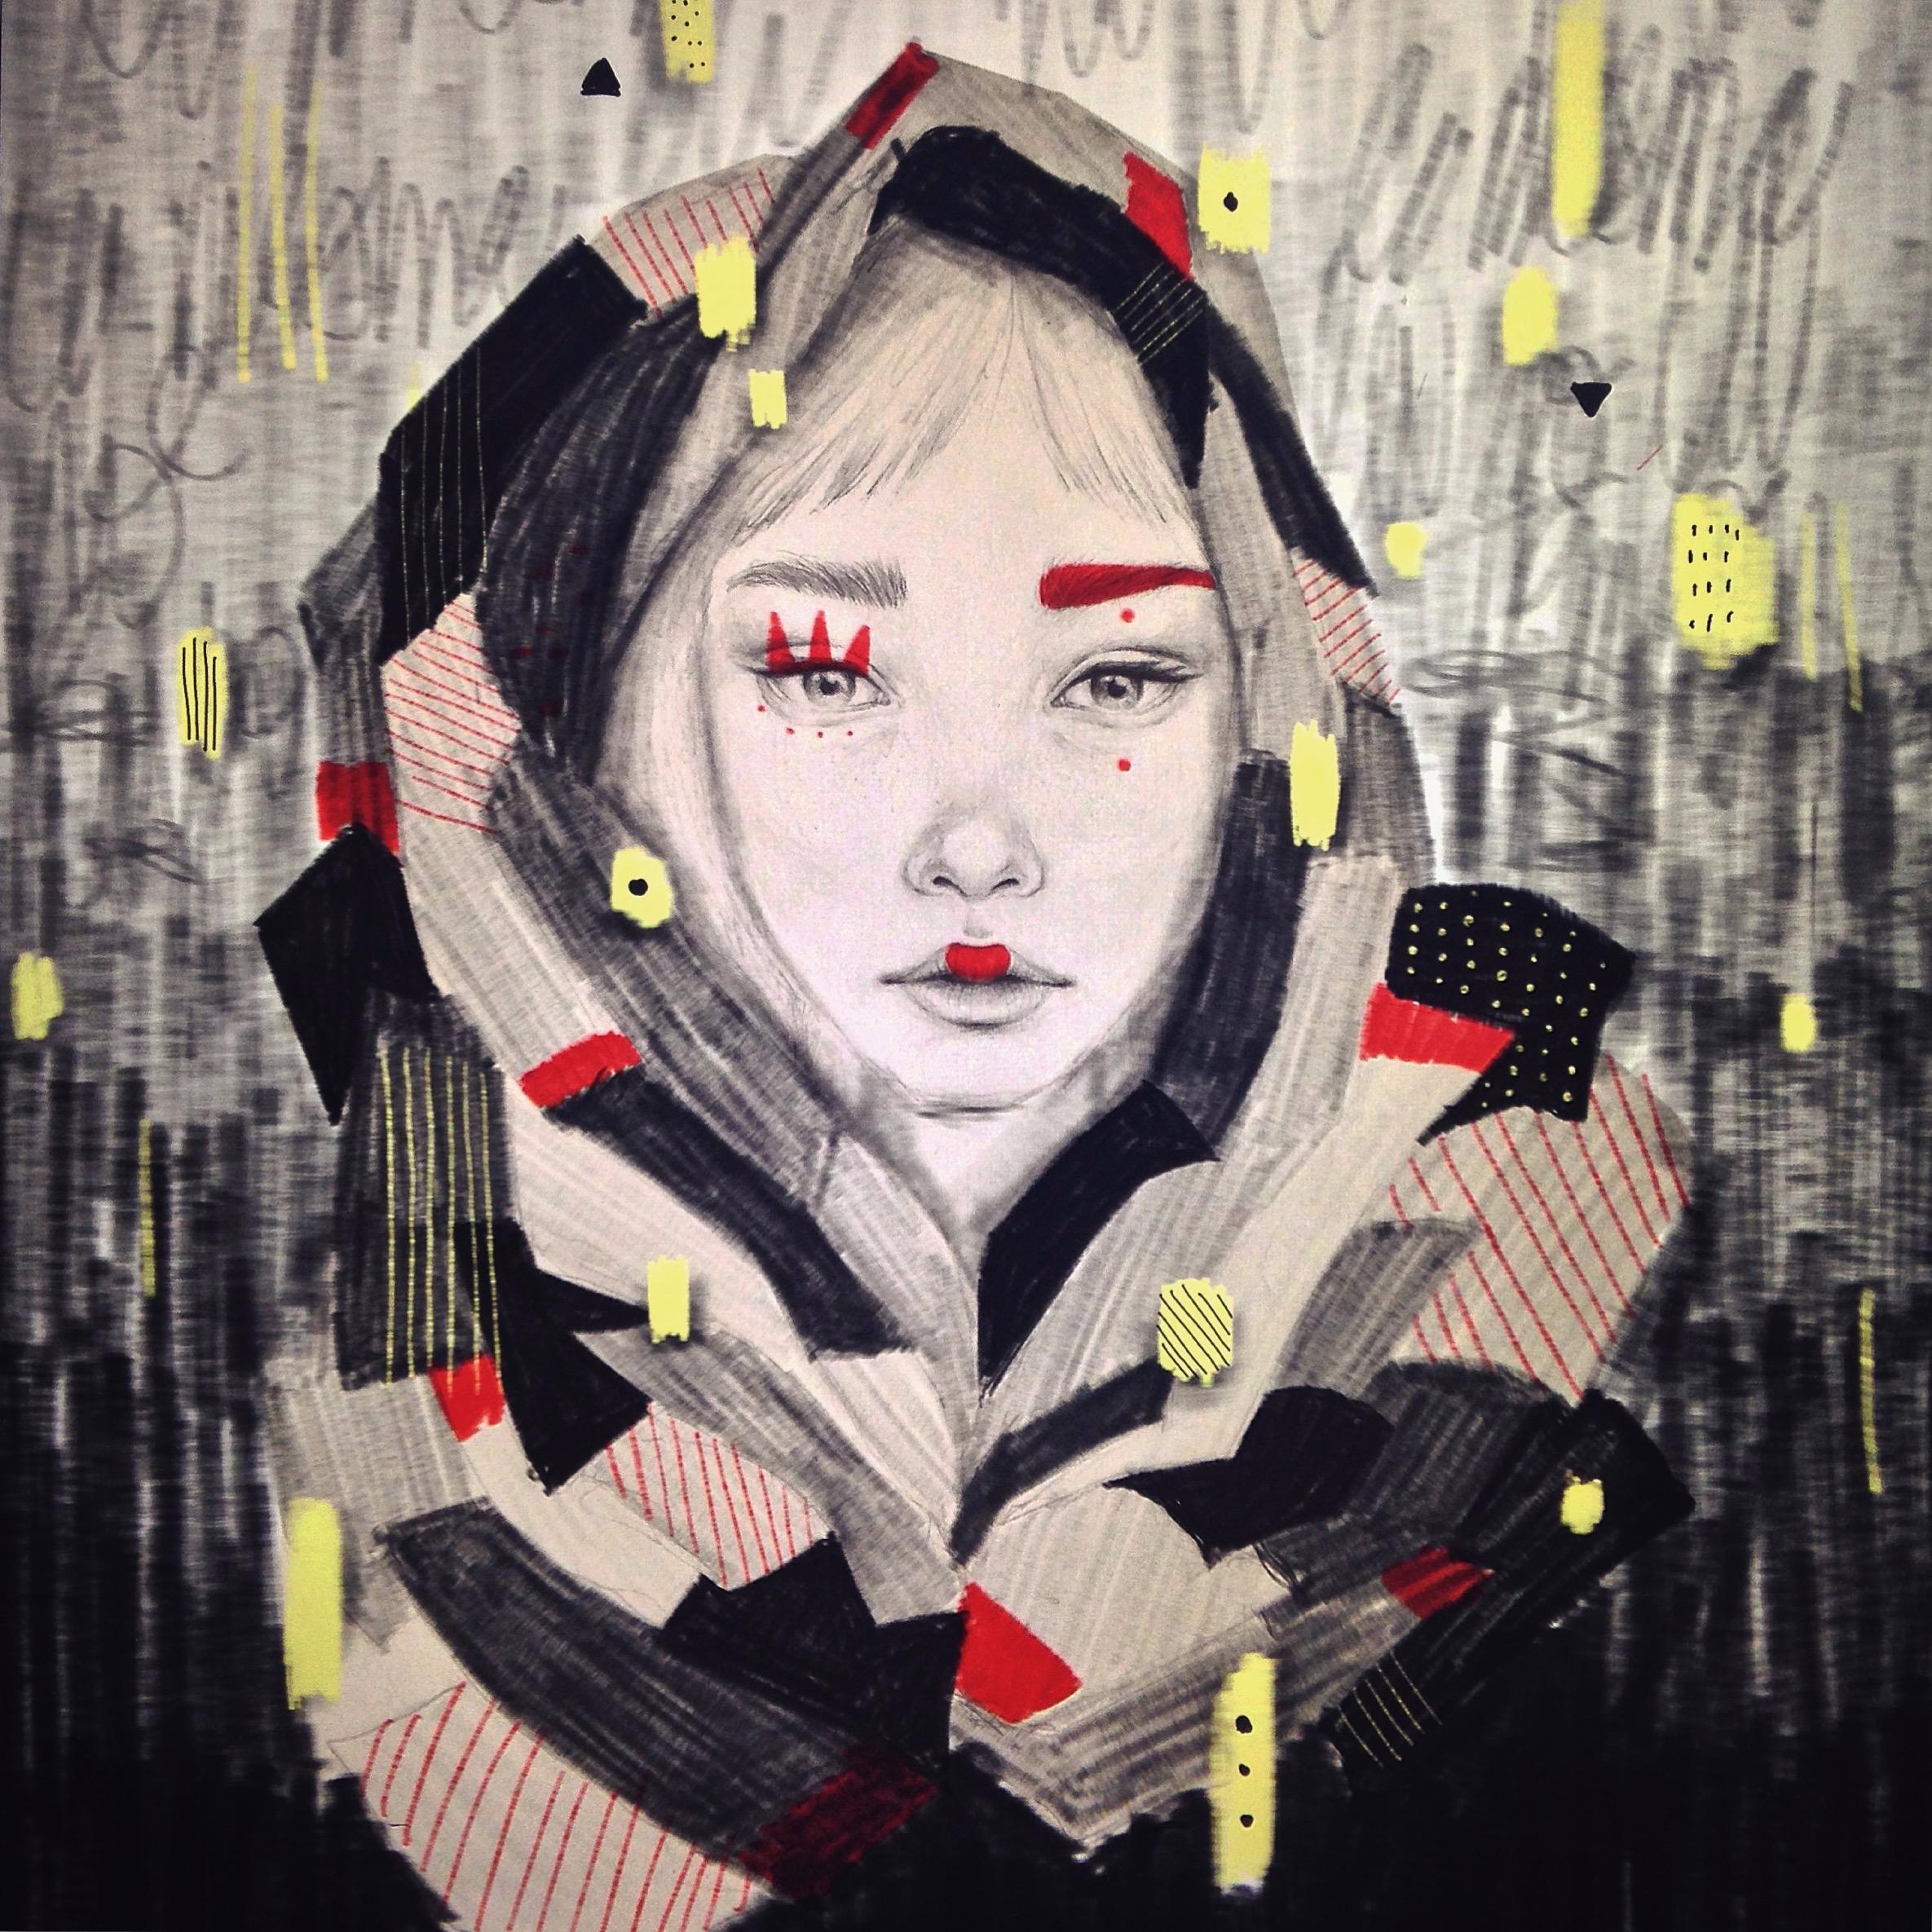 tokastudio, art, illustration - tokastudio | ello